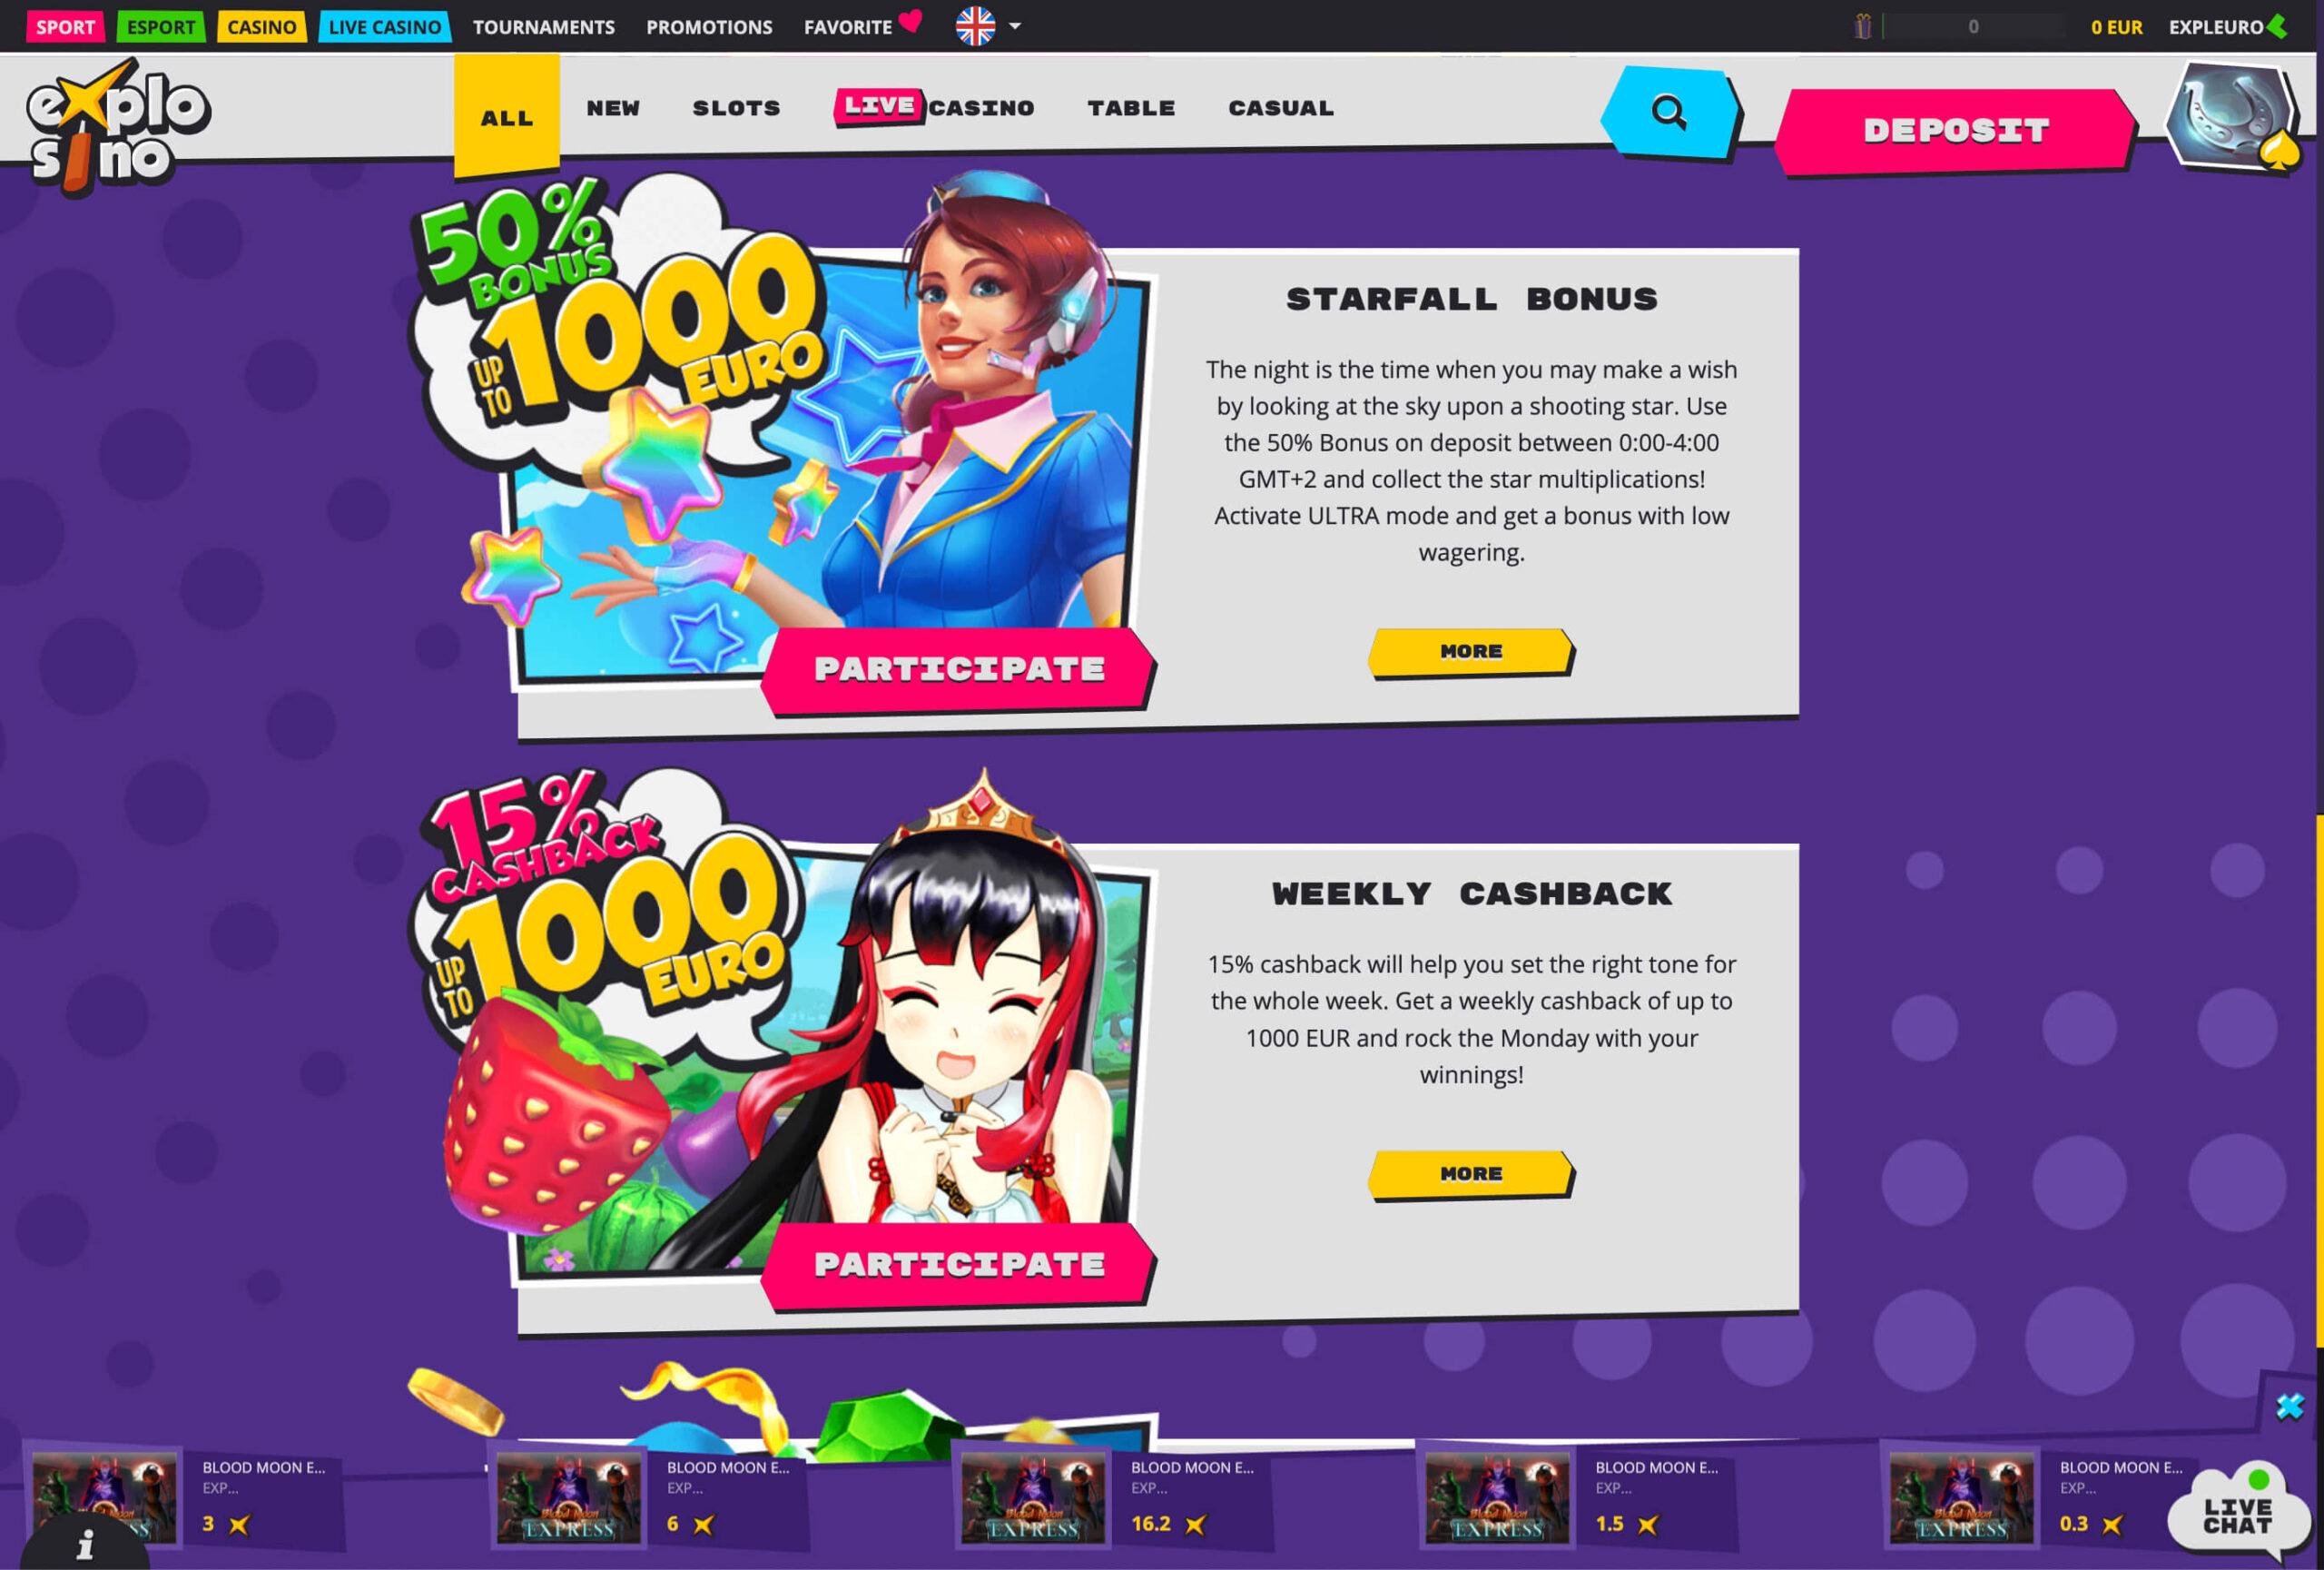 Explosino casino bonuses